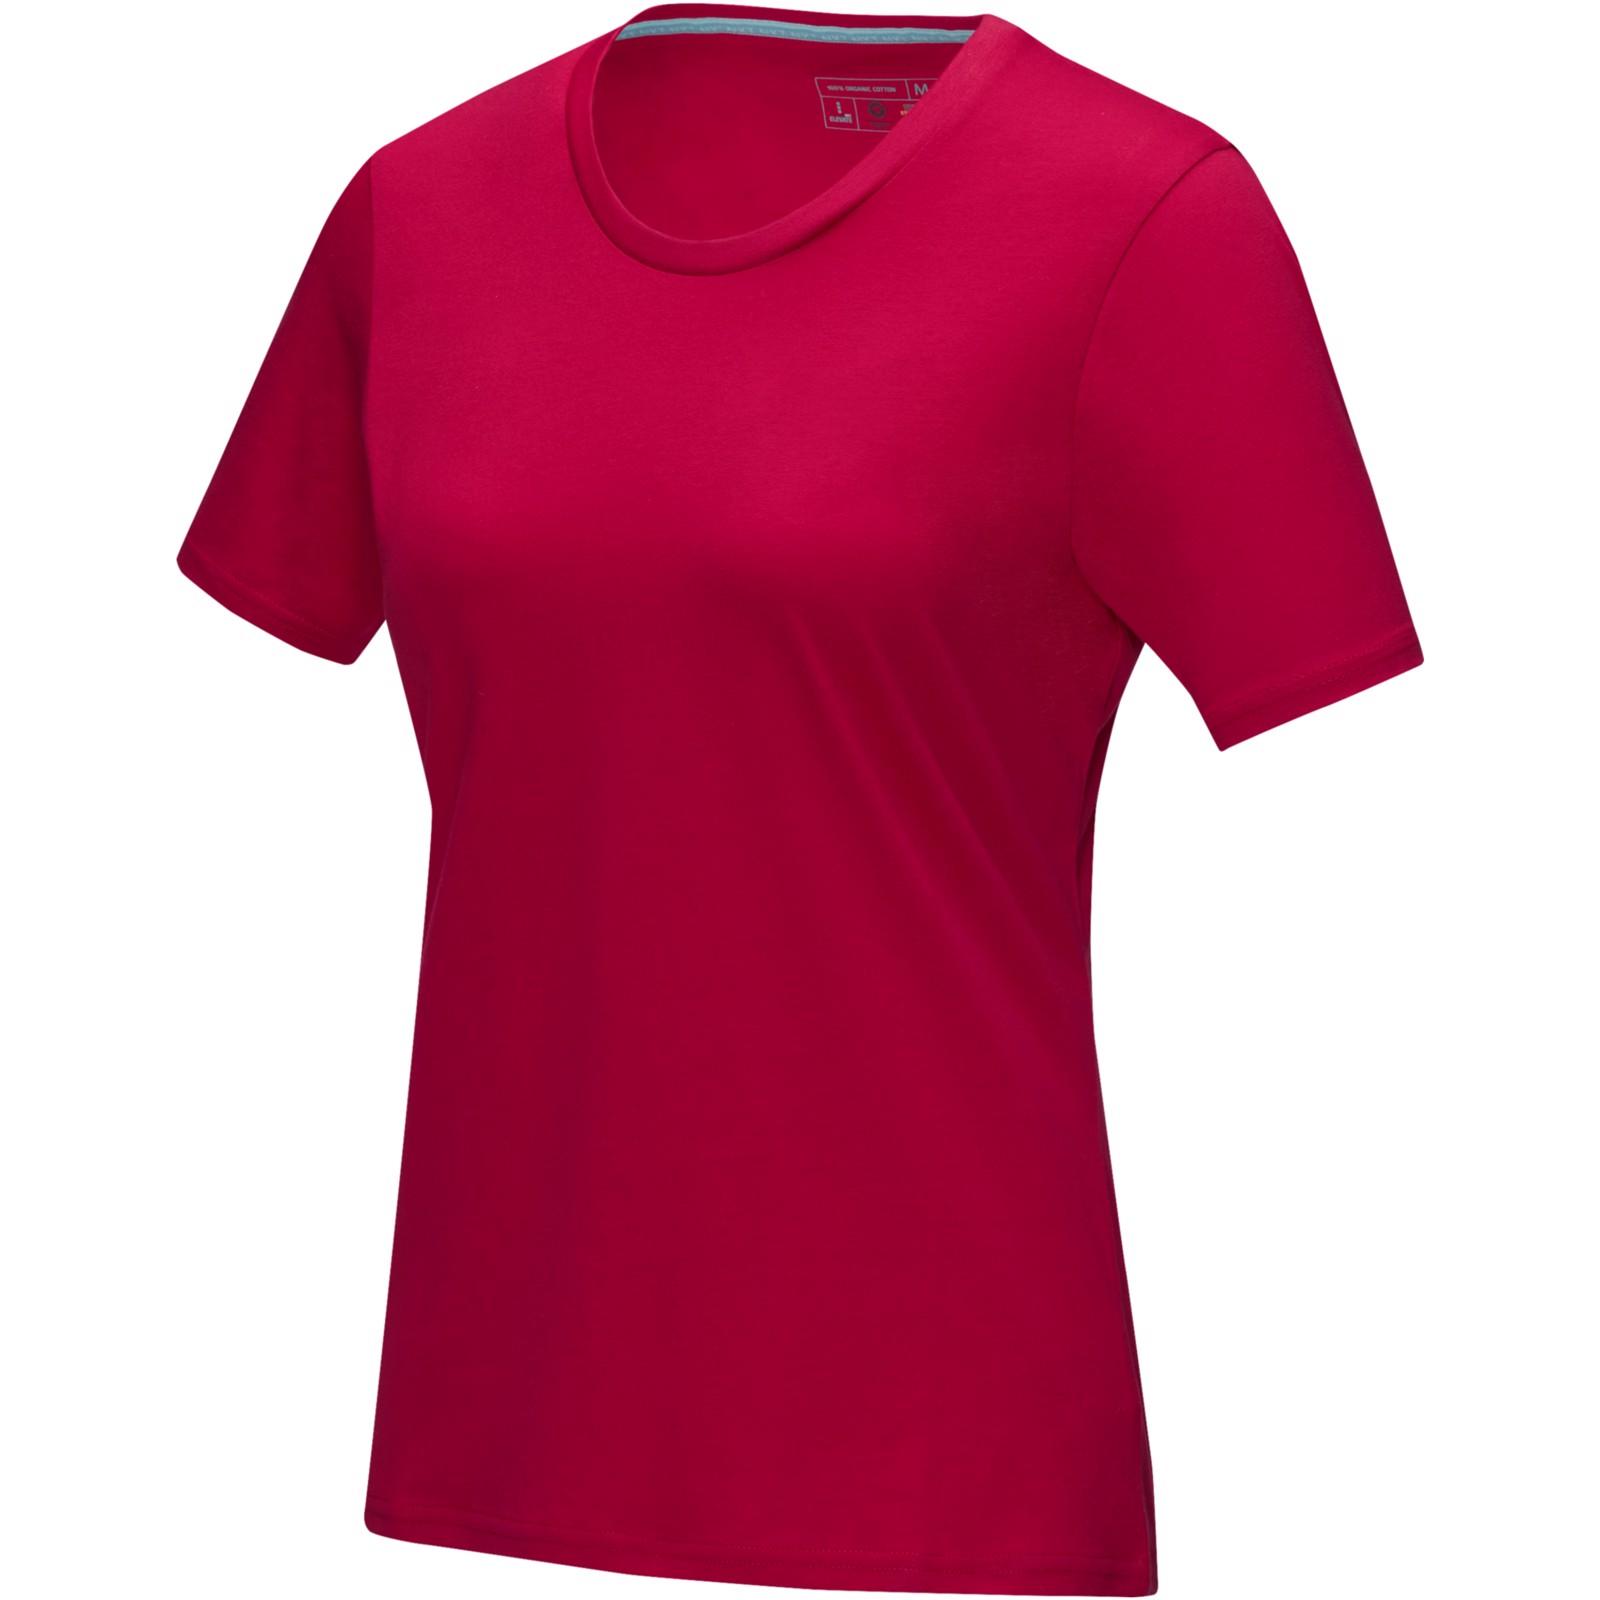 Azurite short sleeve women's GOTS organic t-shirt - Red / XS